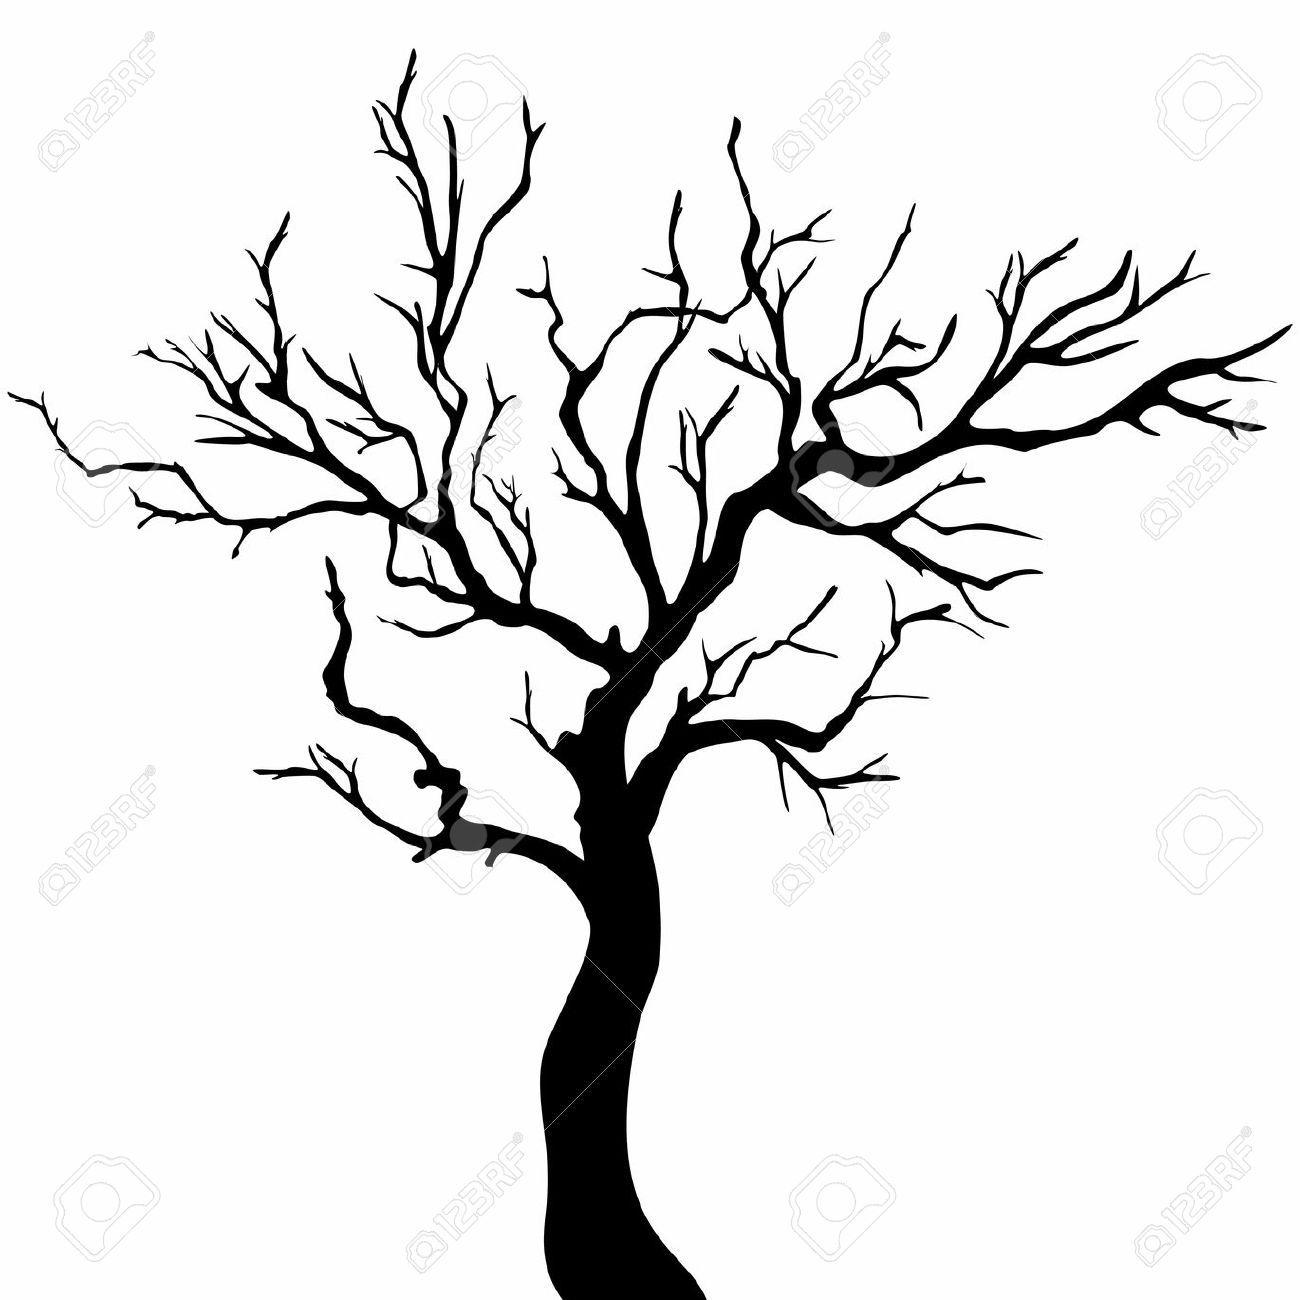 clip art tree silhouette - photo #46